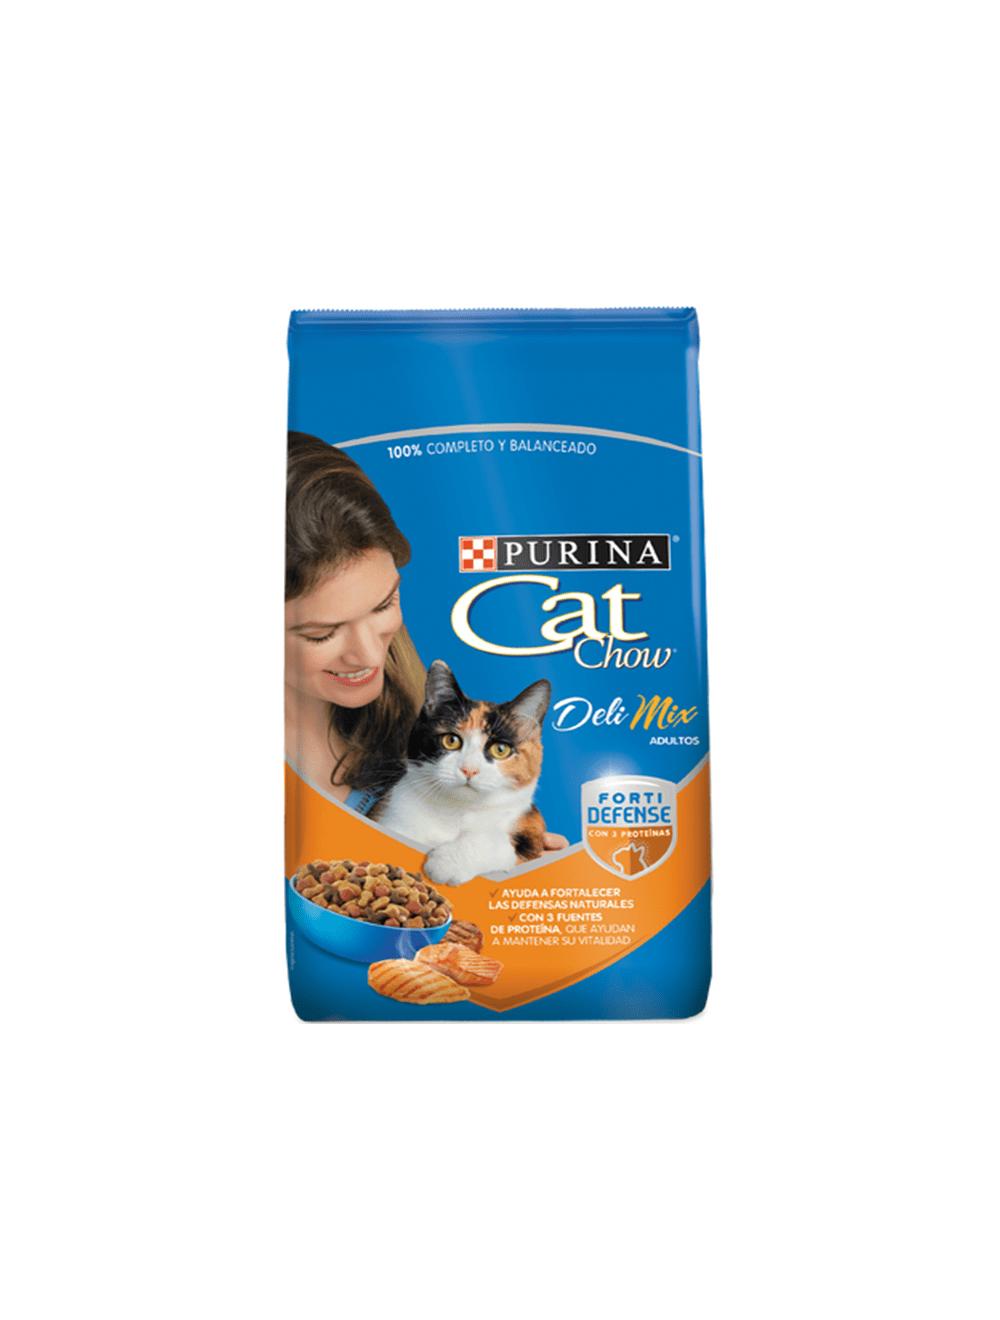 Purina Cat Chow Delimix 10 kg